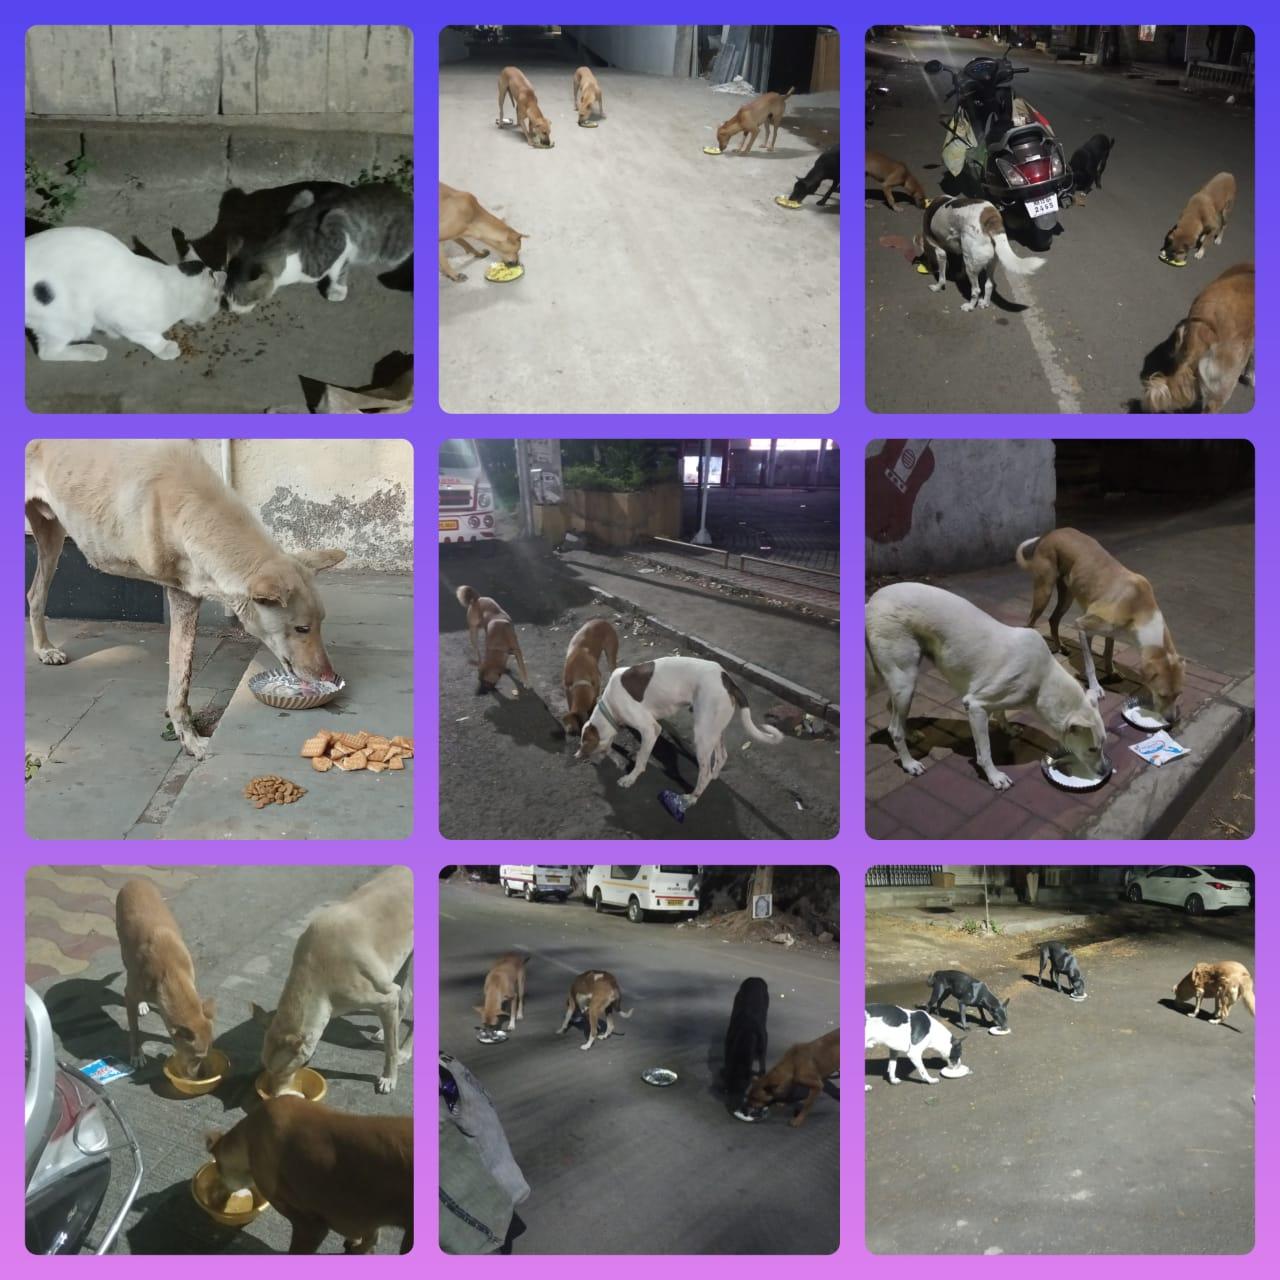 JOSHConnect Foundation Feeding Stray Dogs